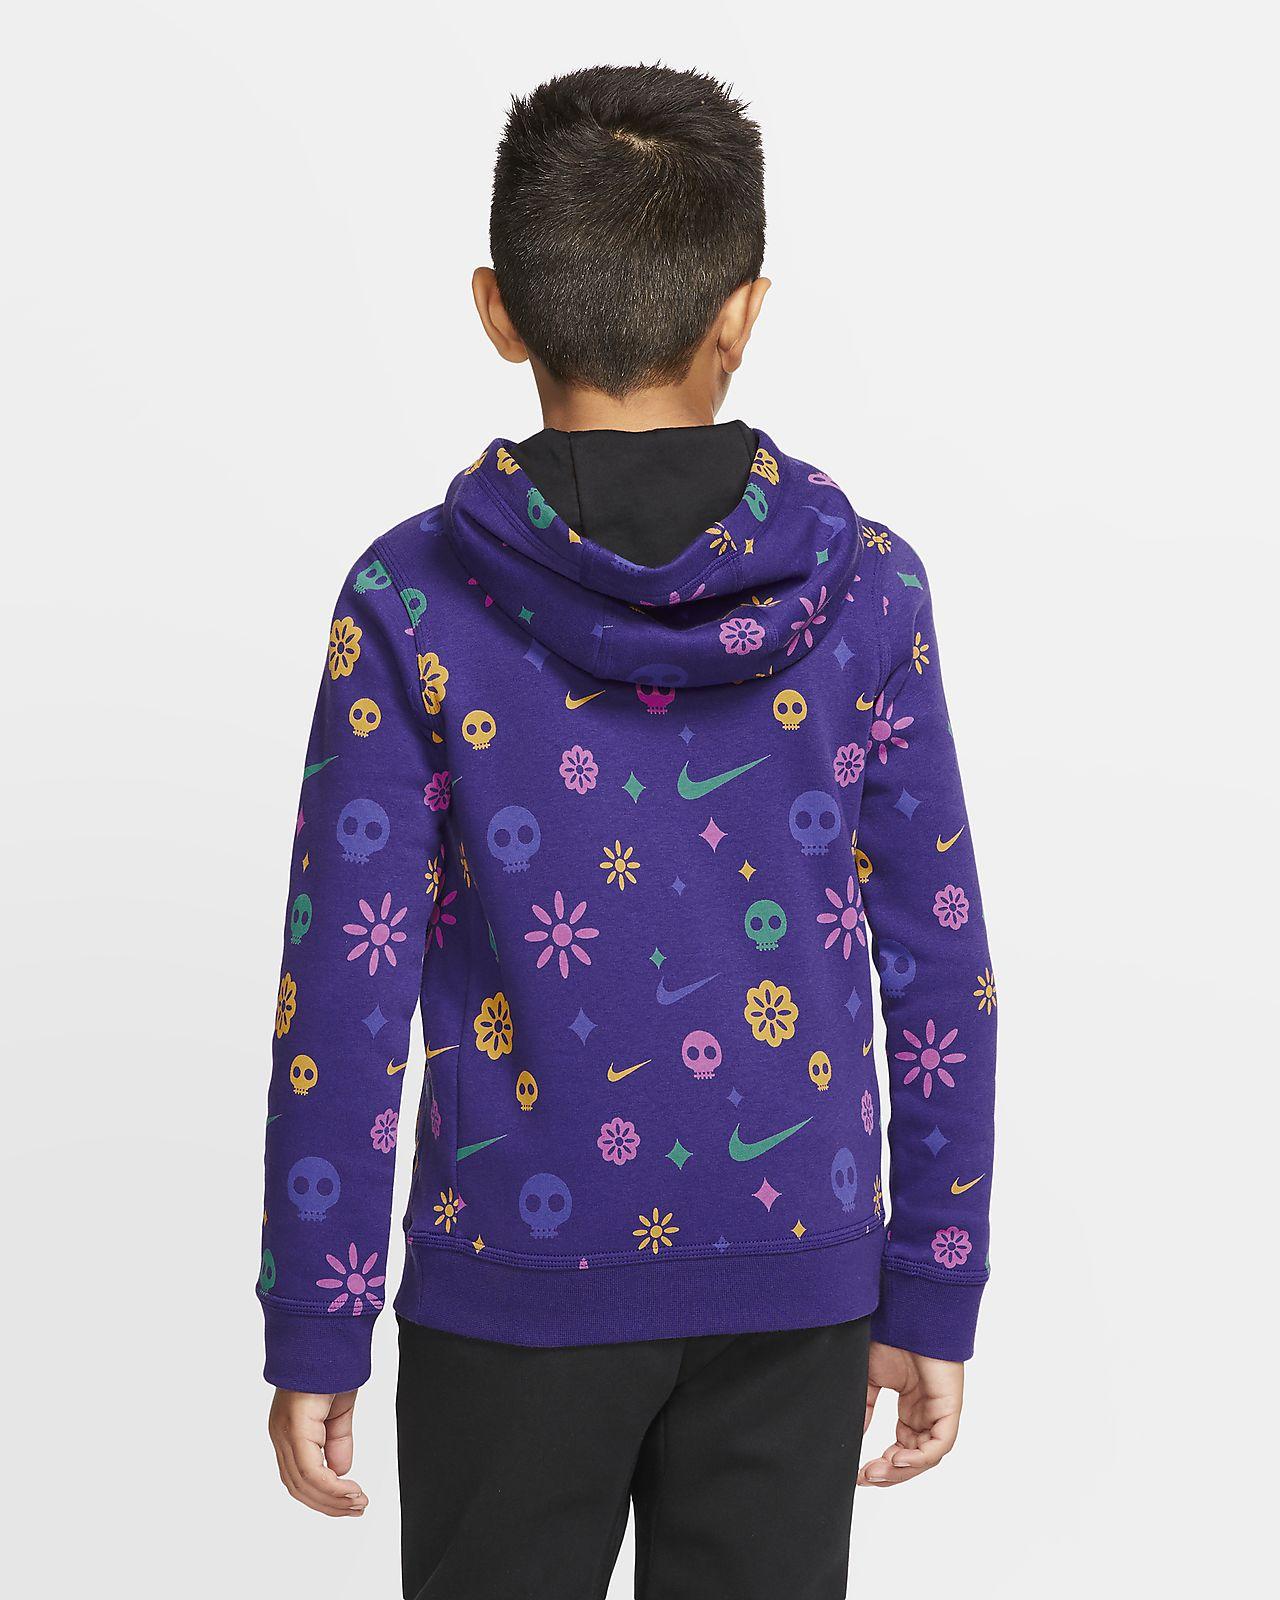 nike hoodie youth